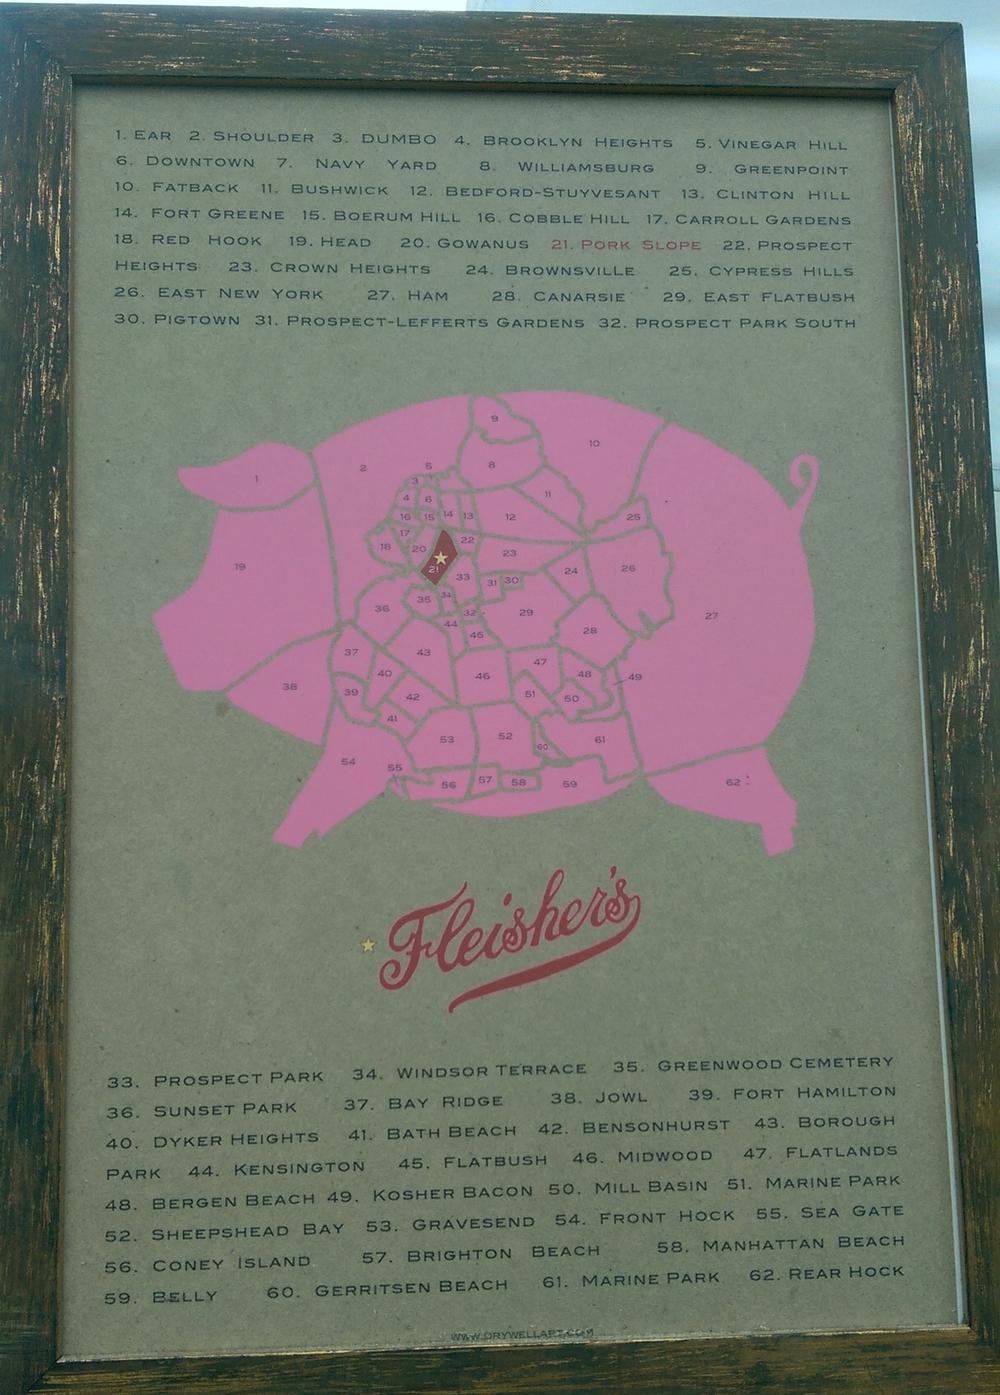 Fleisher's Craft Butchery